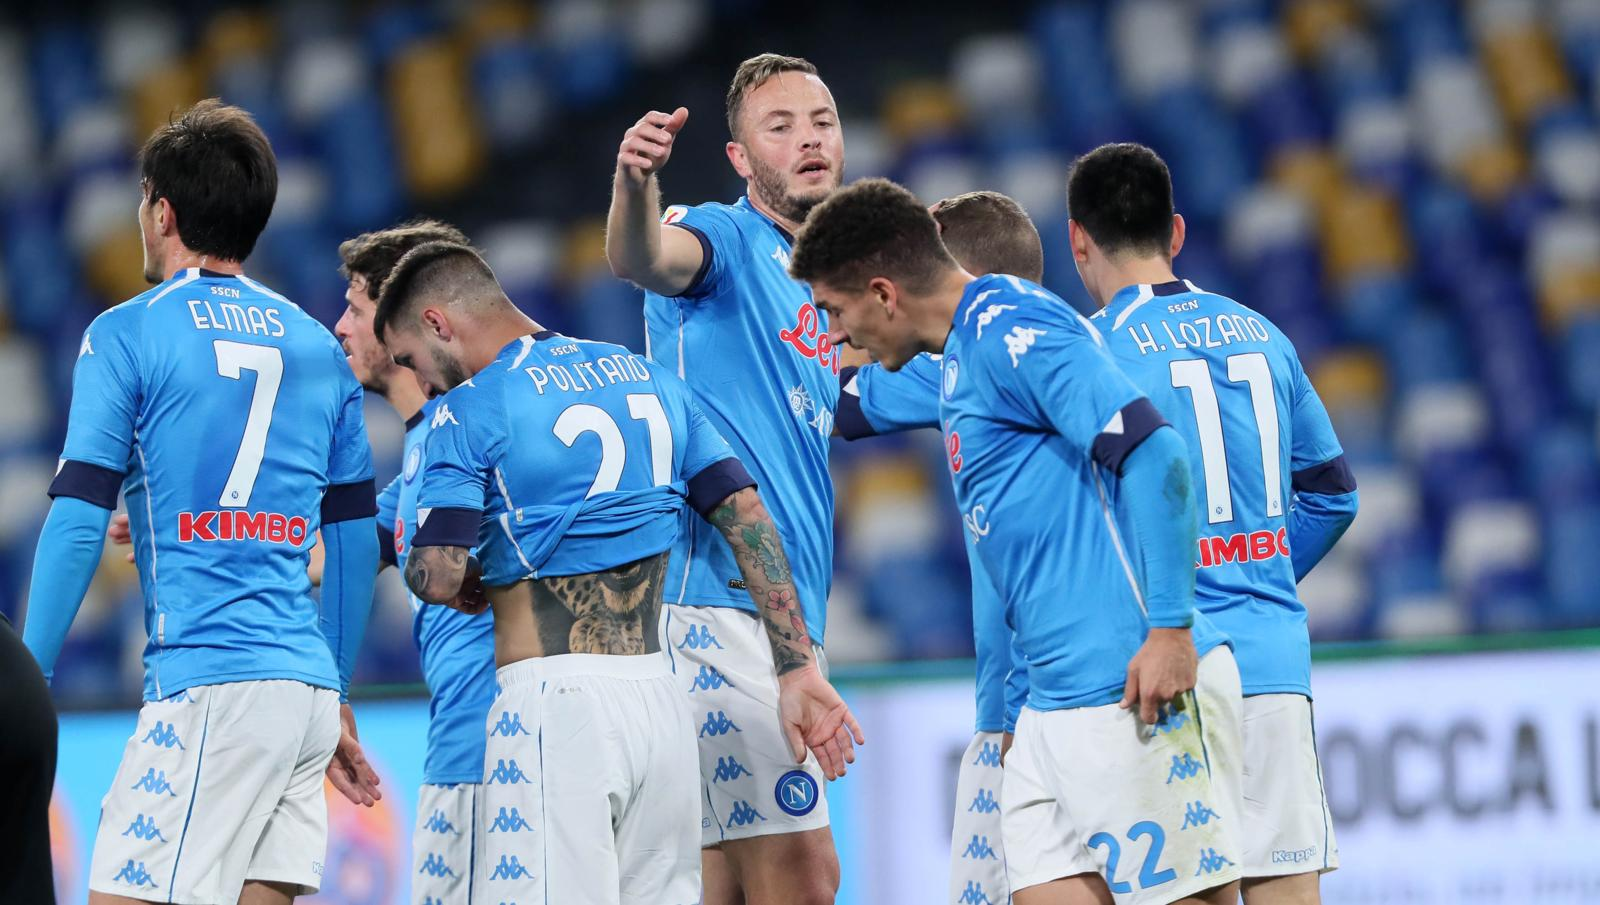 Coppa Italia: Bajrami spaventa il Napoli, ma Petagna mette ko l'Empoli